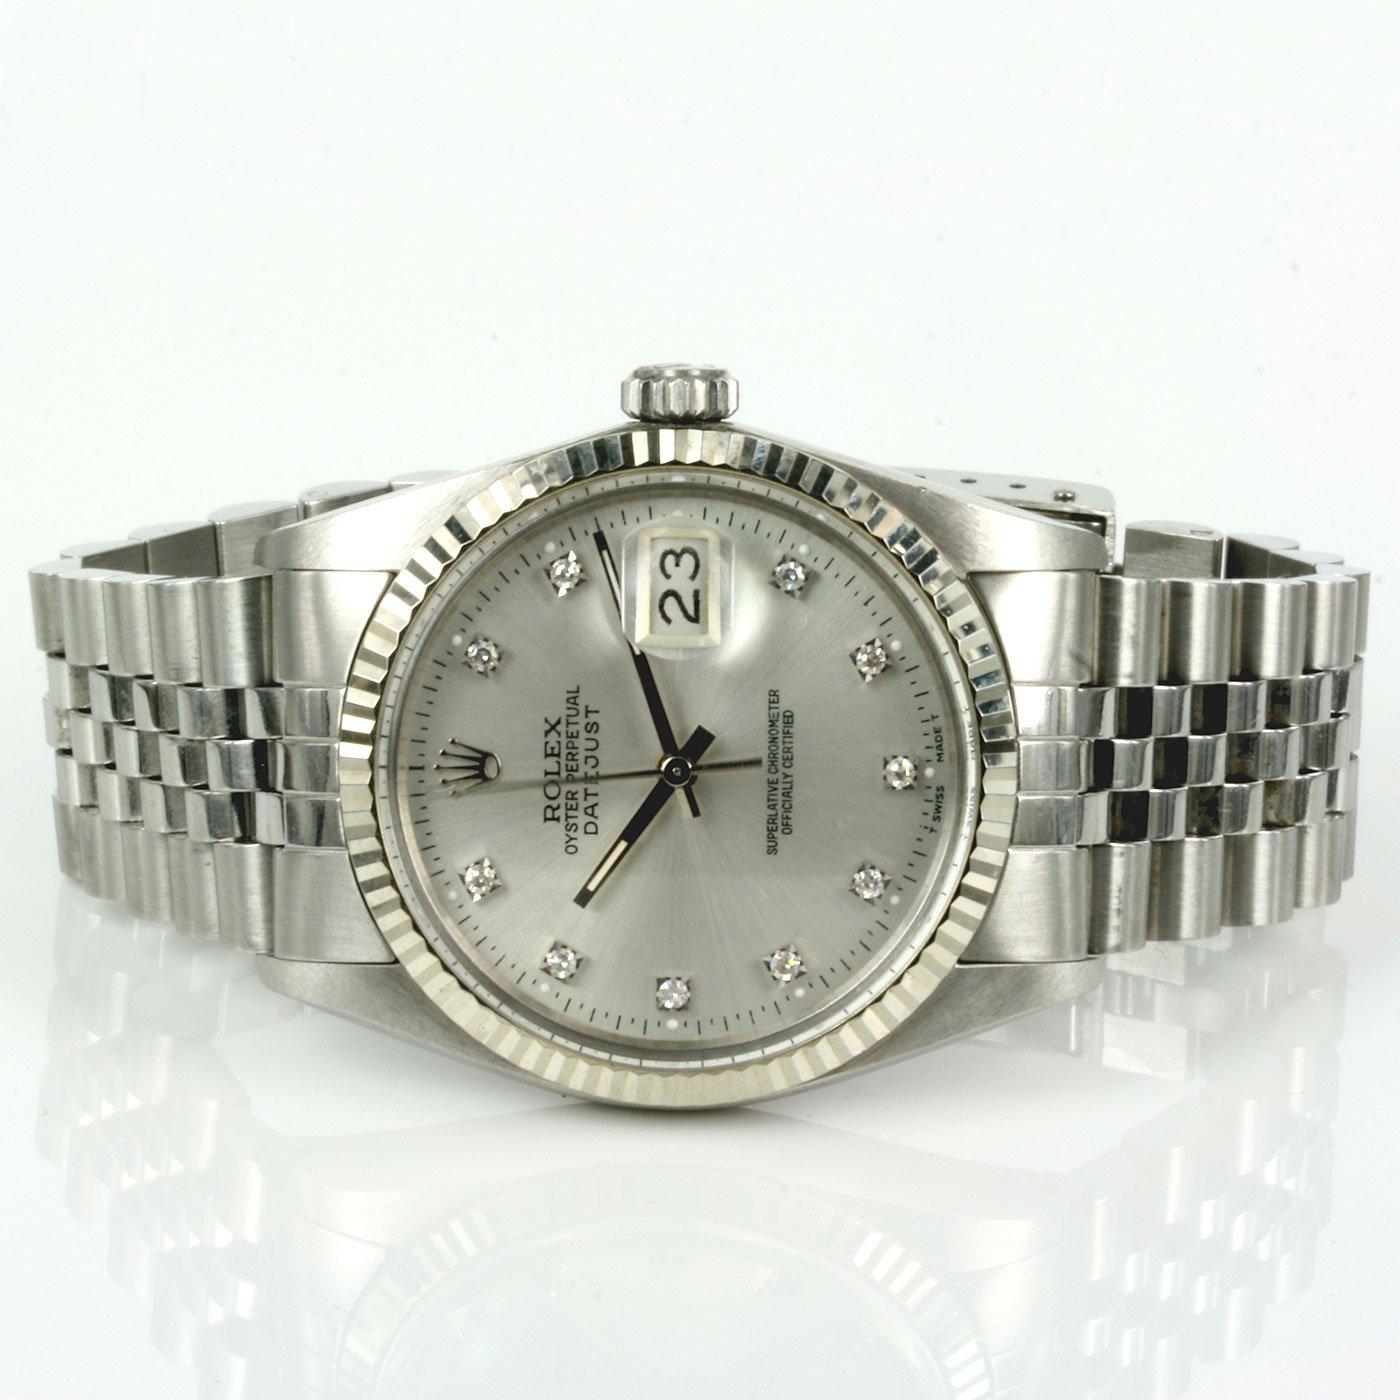 Diamond dial Rolex datejust model 16014